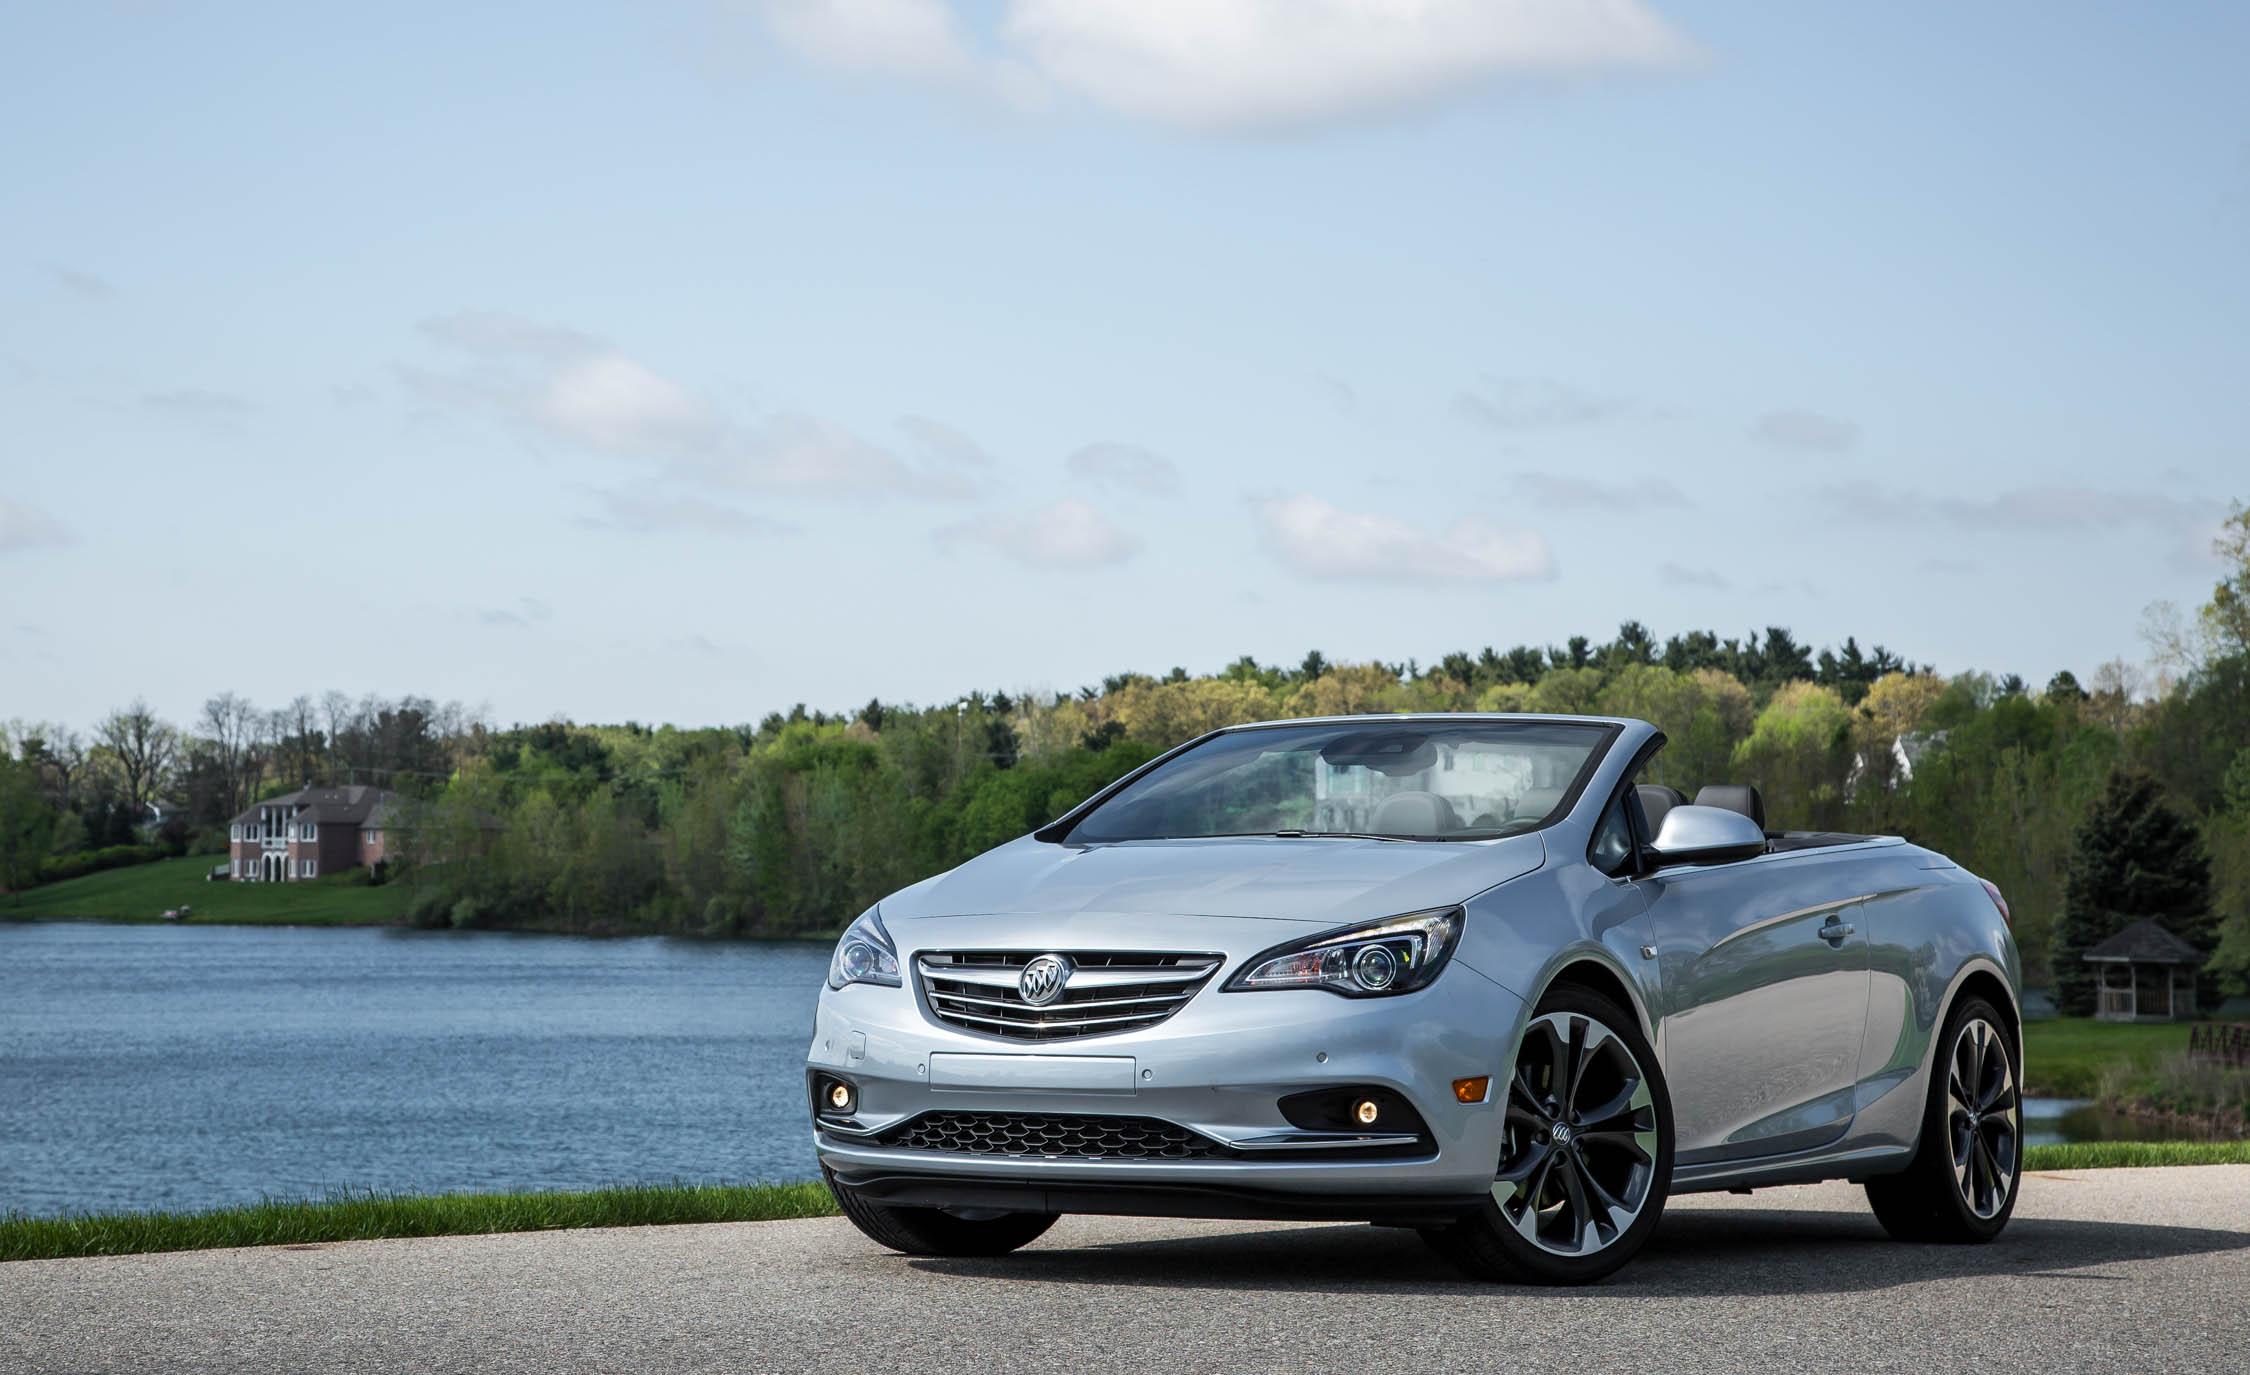 2016 Buick Cascada Premium (Photo 1 of 24)